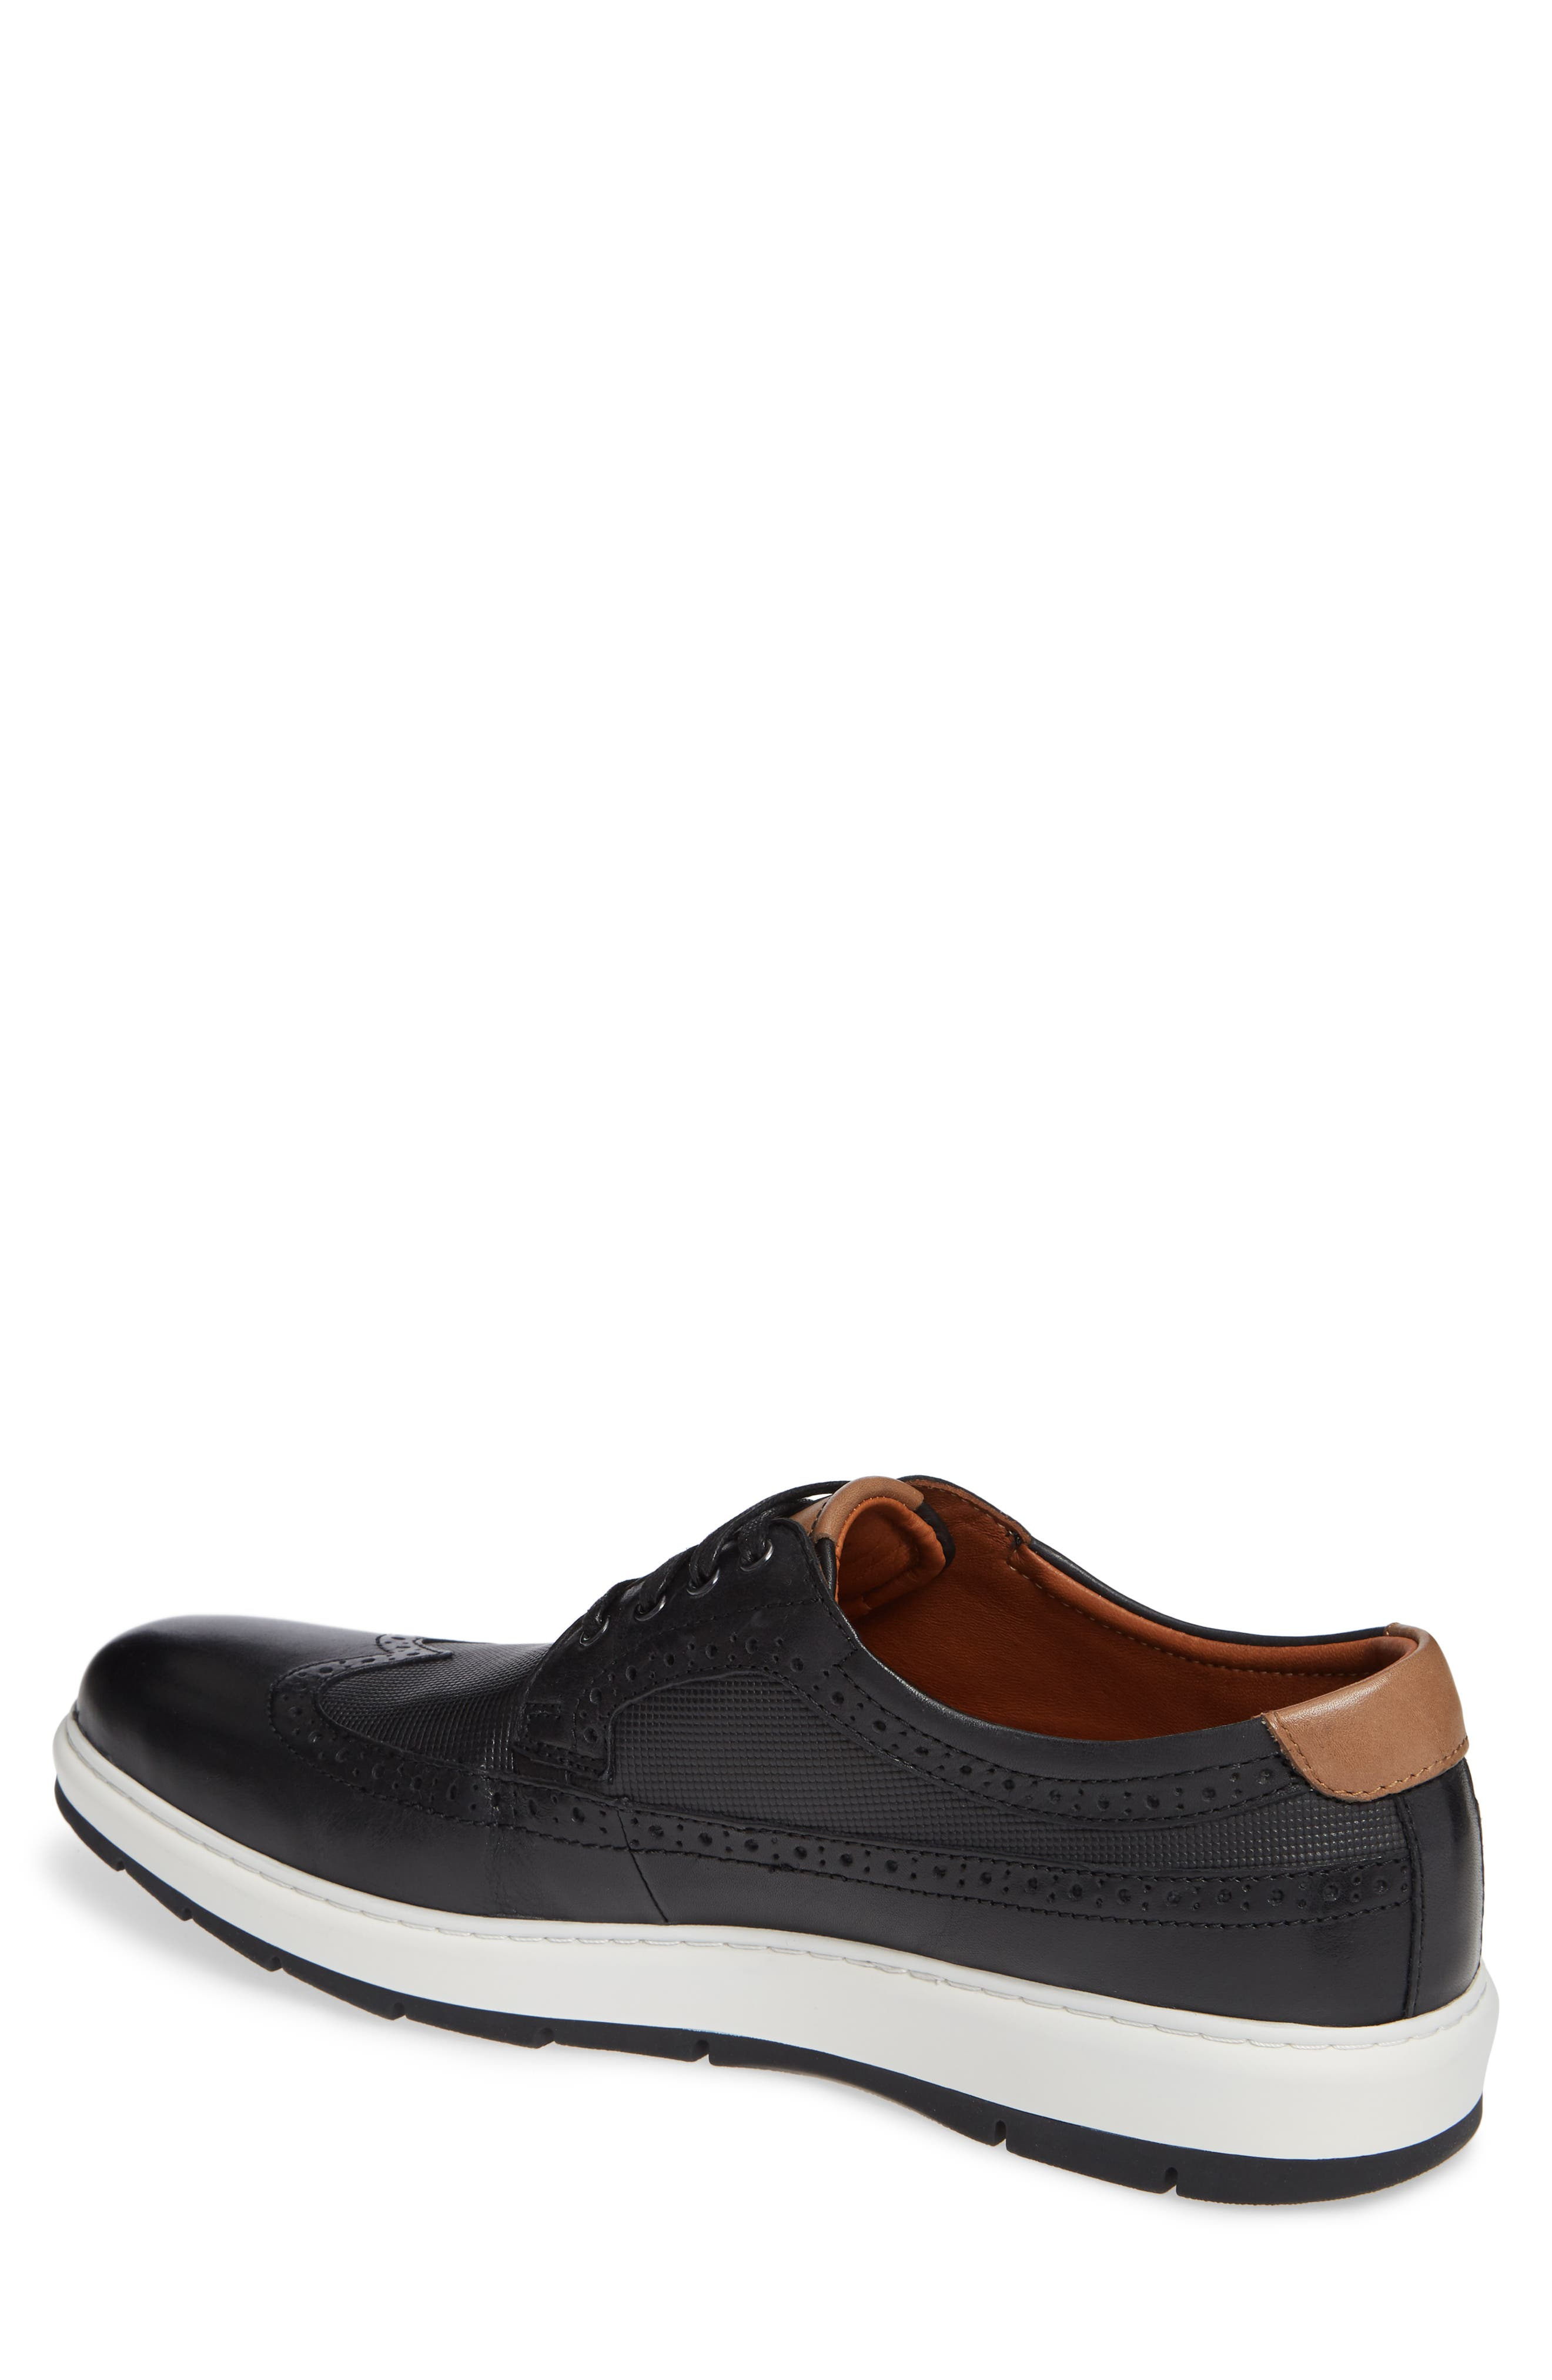 Elliston Wingtip Sneaker,                             Alternate thumbnail 2, color,                             BLACK LEATHER